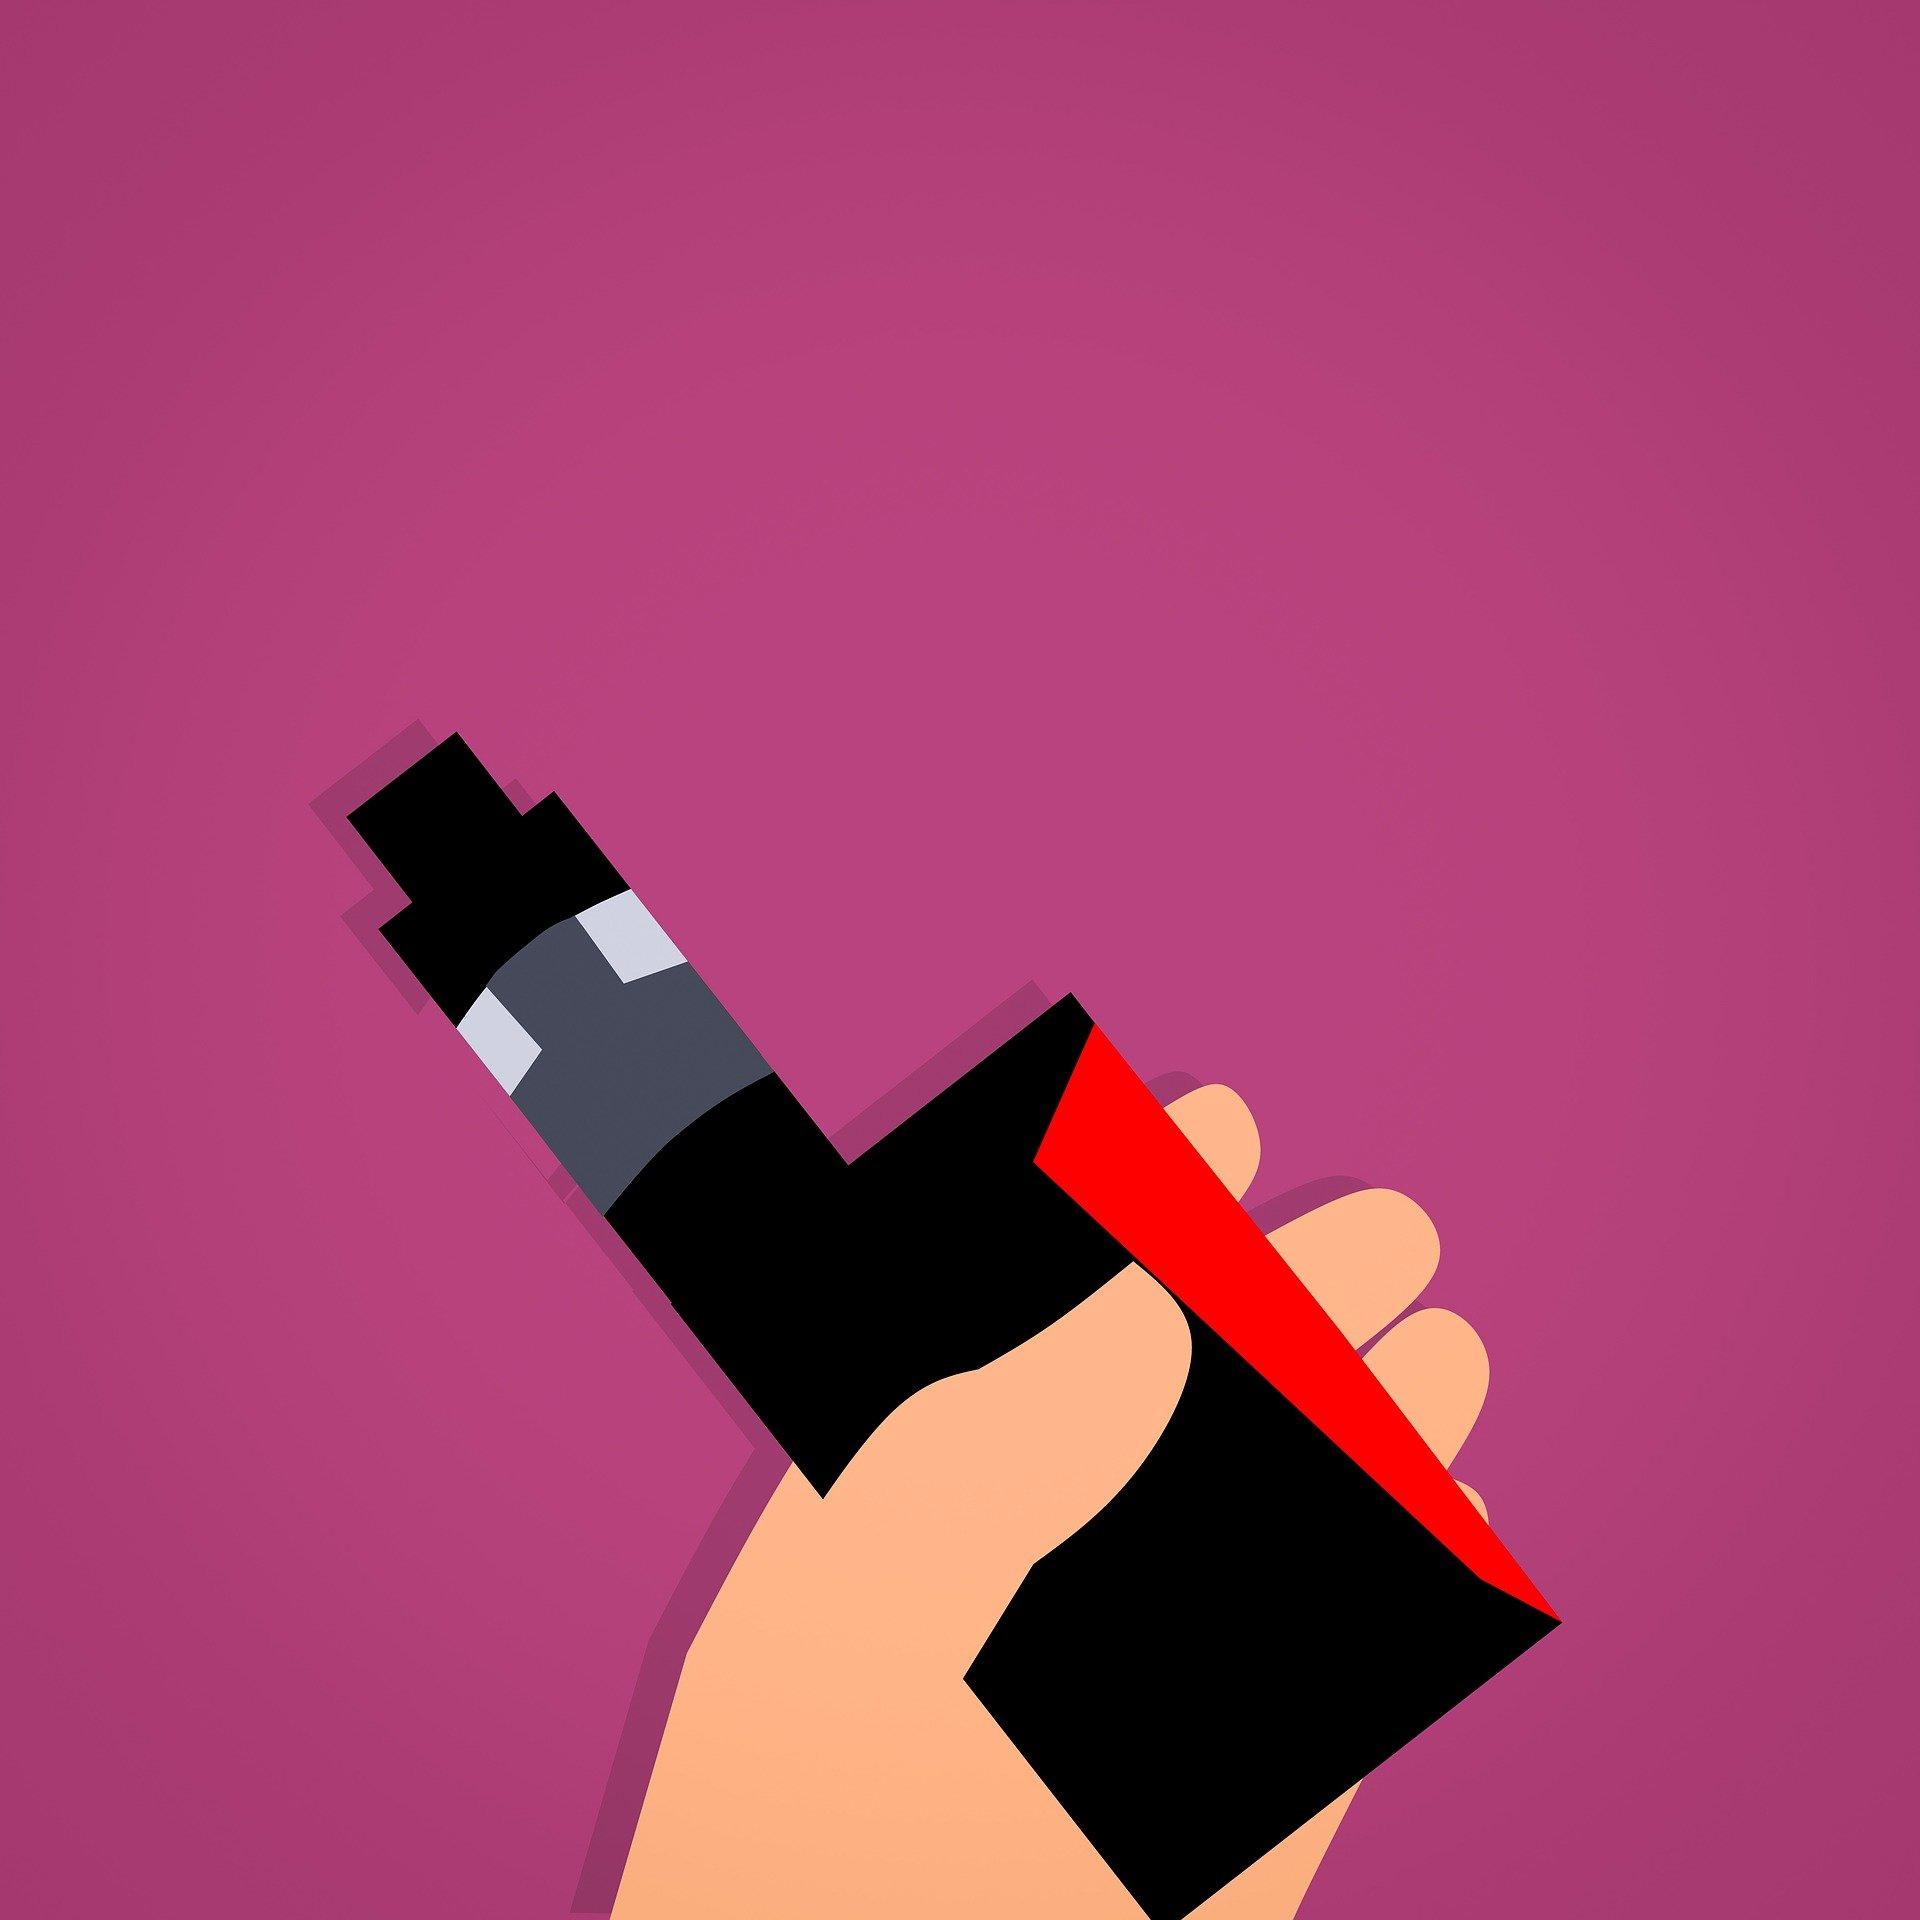 E-Cigarette Popularity on Instagram Is Still Growing Despite an FDA Anti-Vaping Campaign